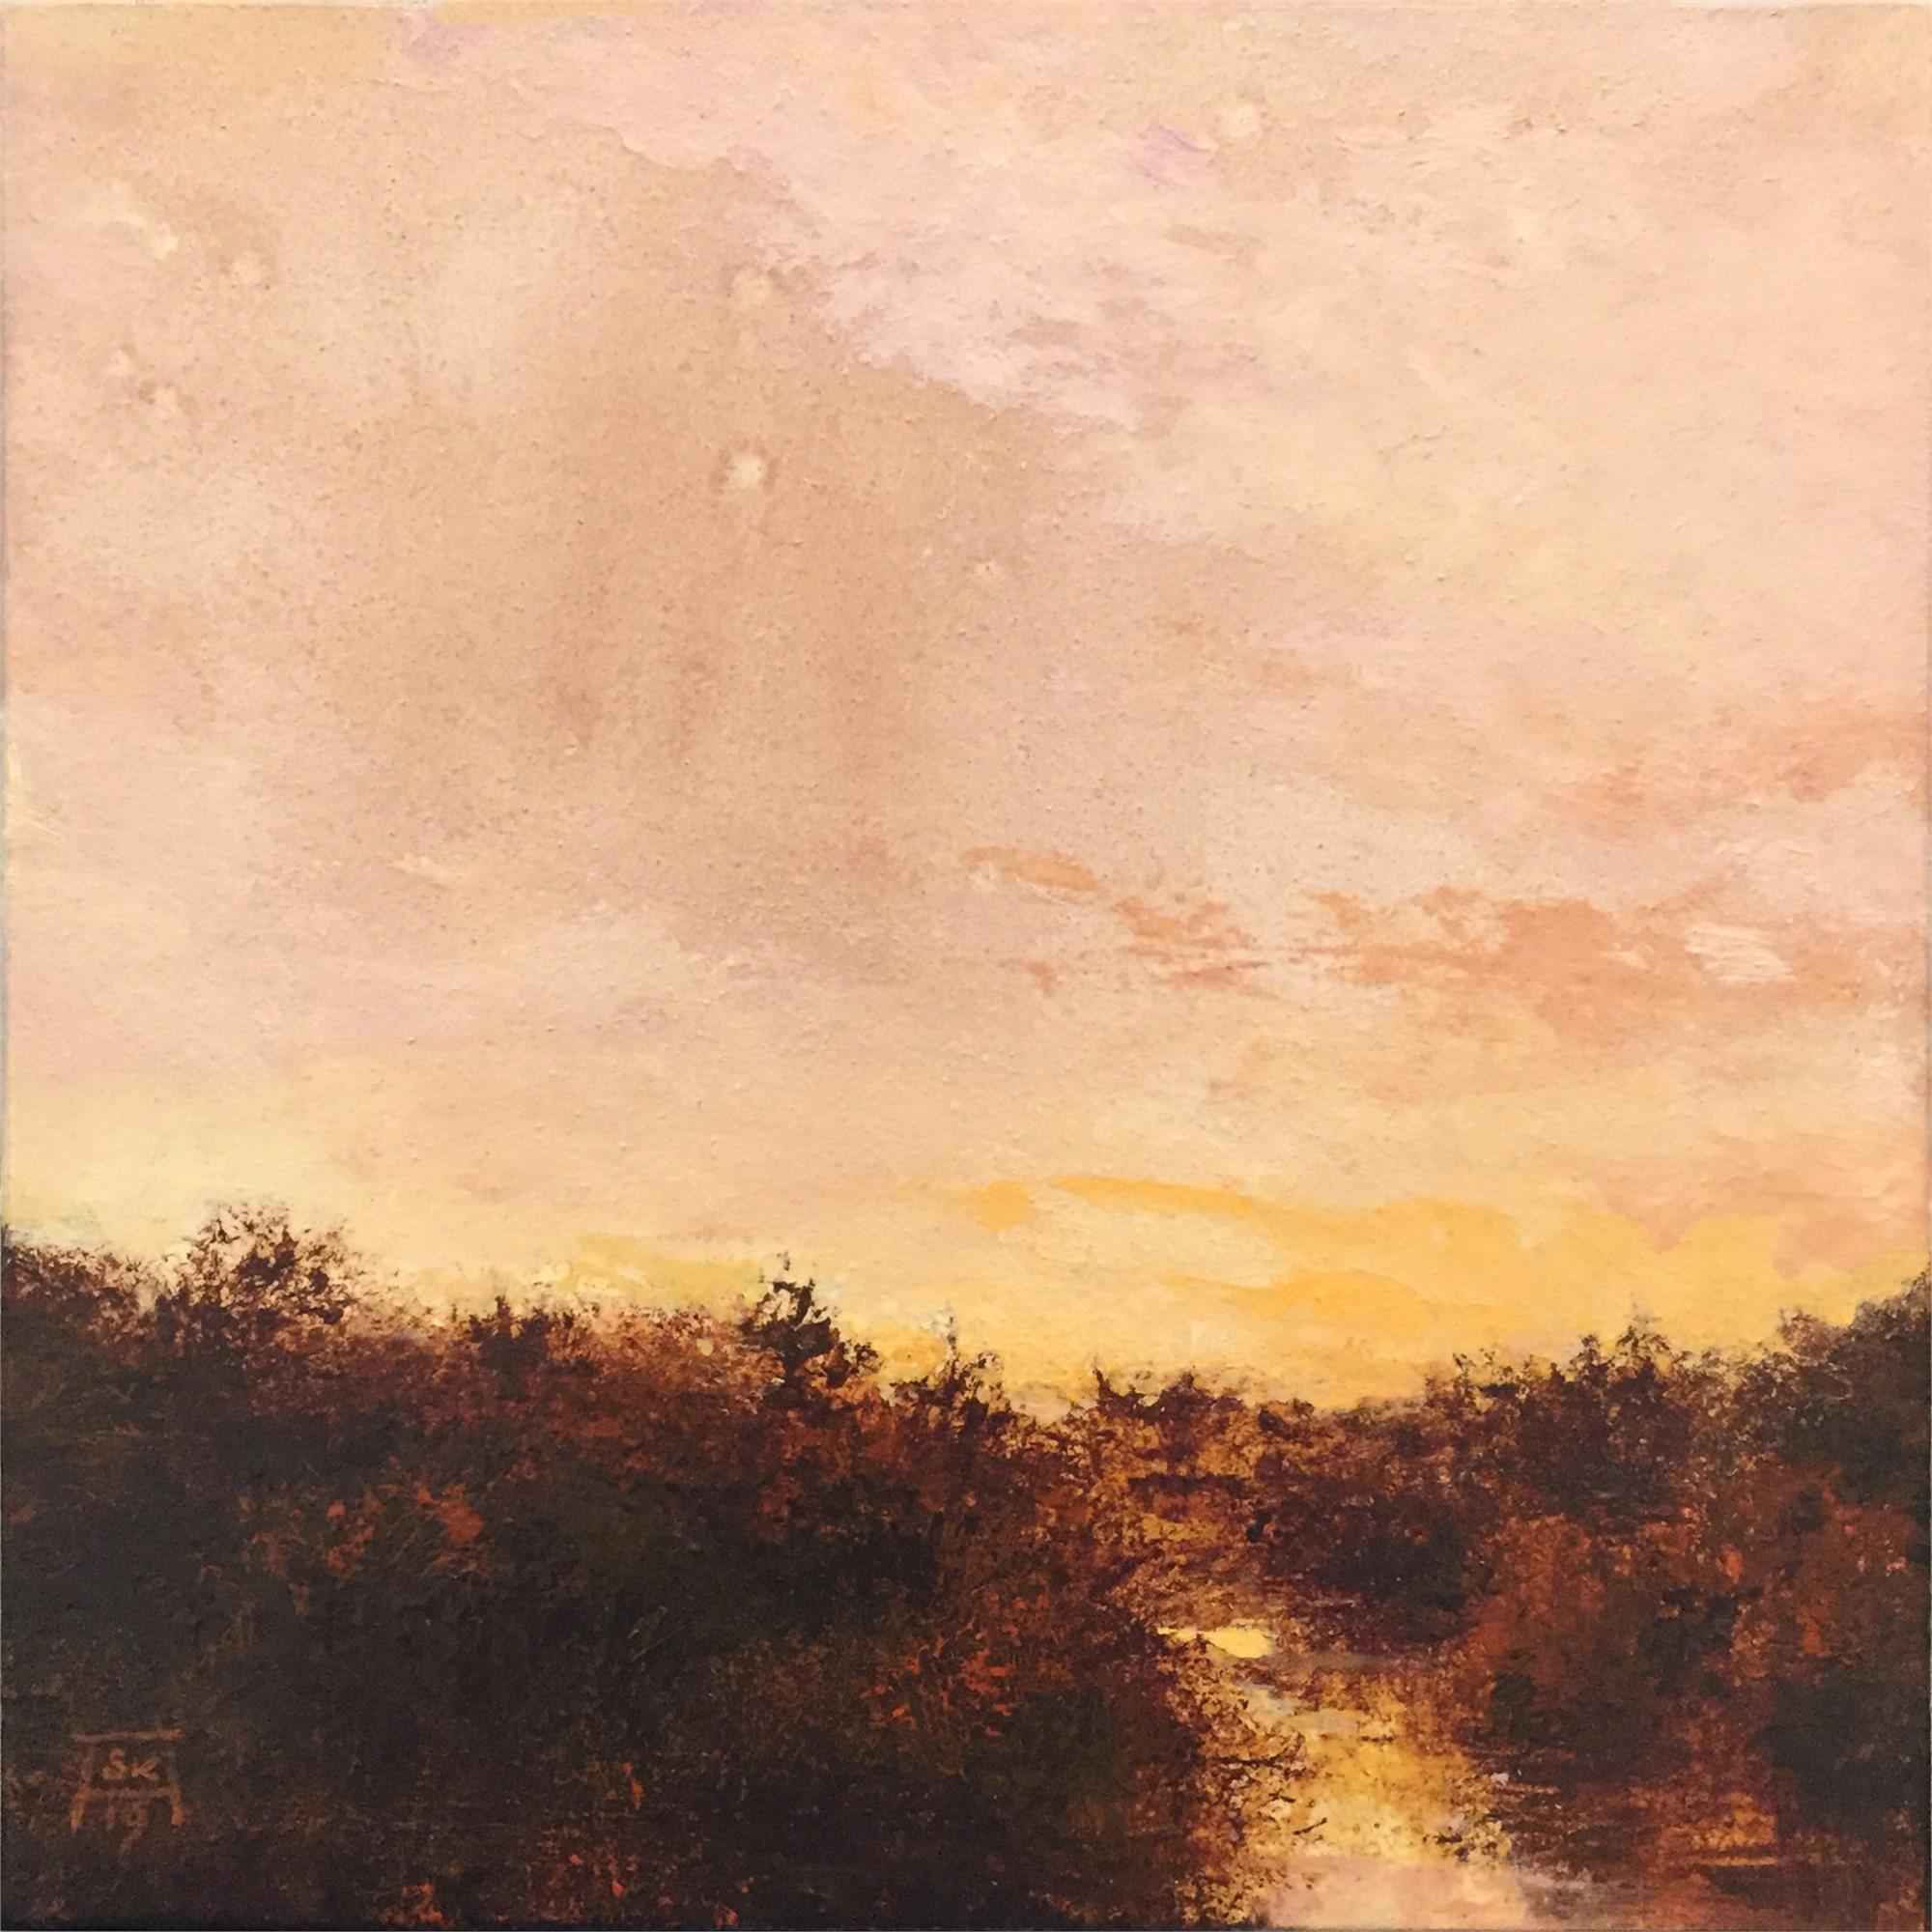 Evening (Ode to B. Crane) by Shawn Krueger